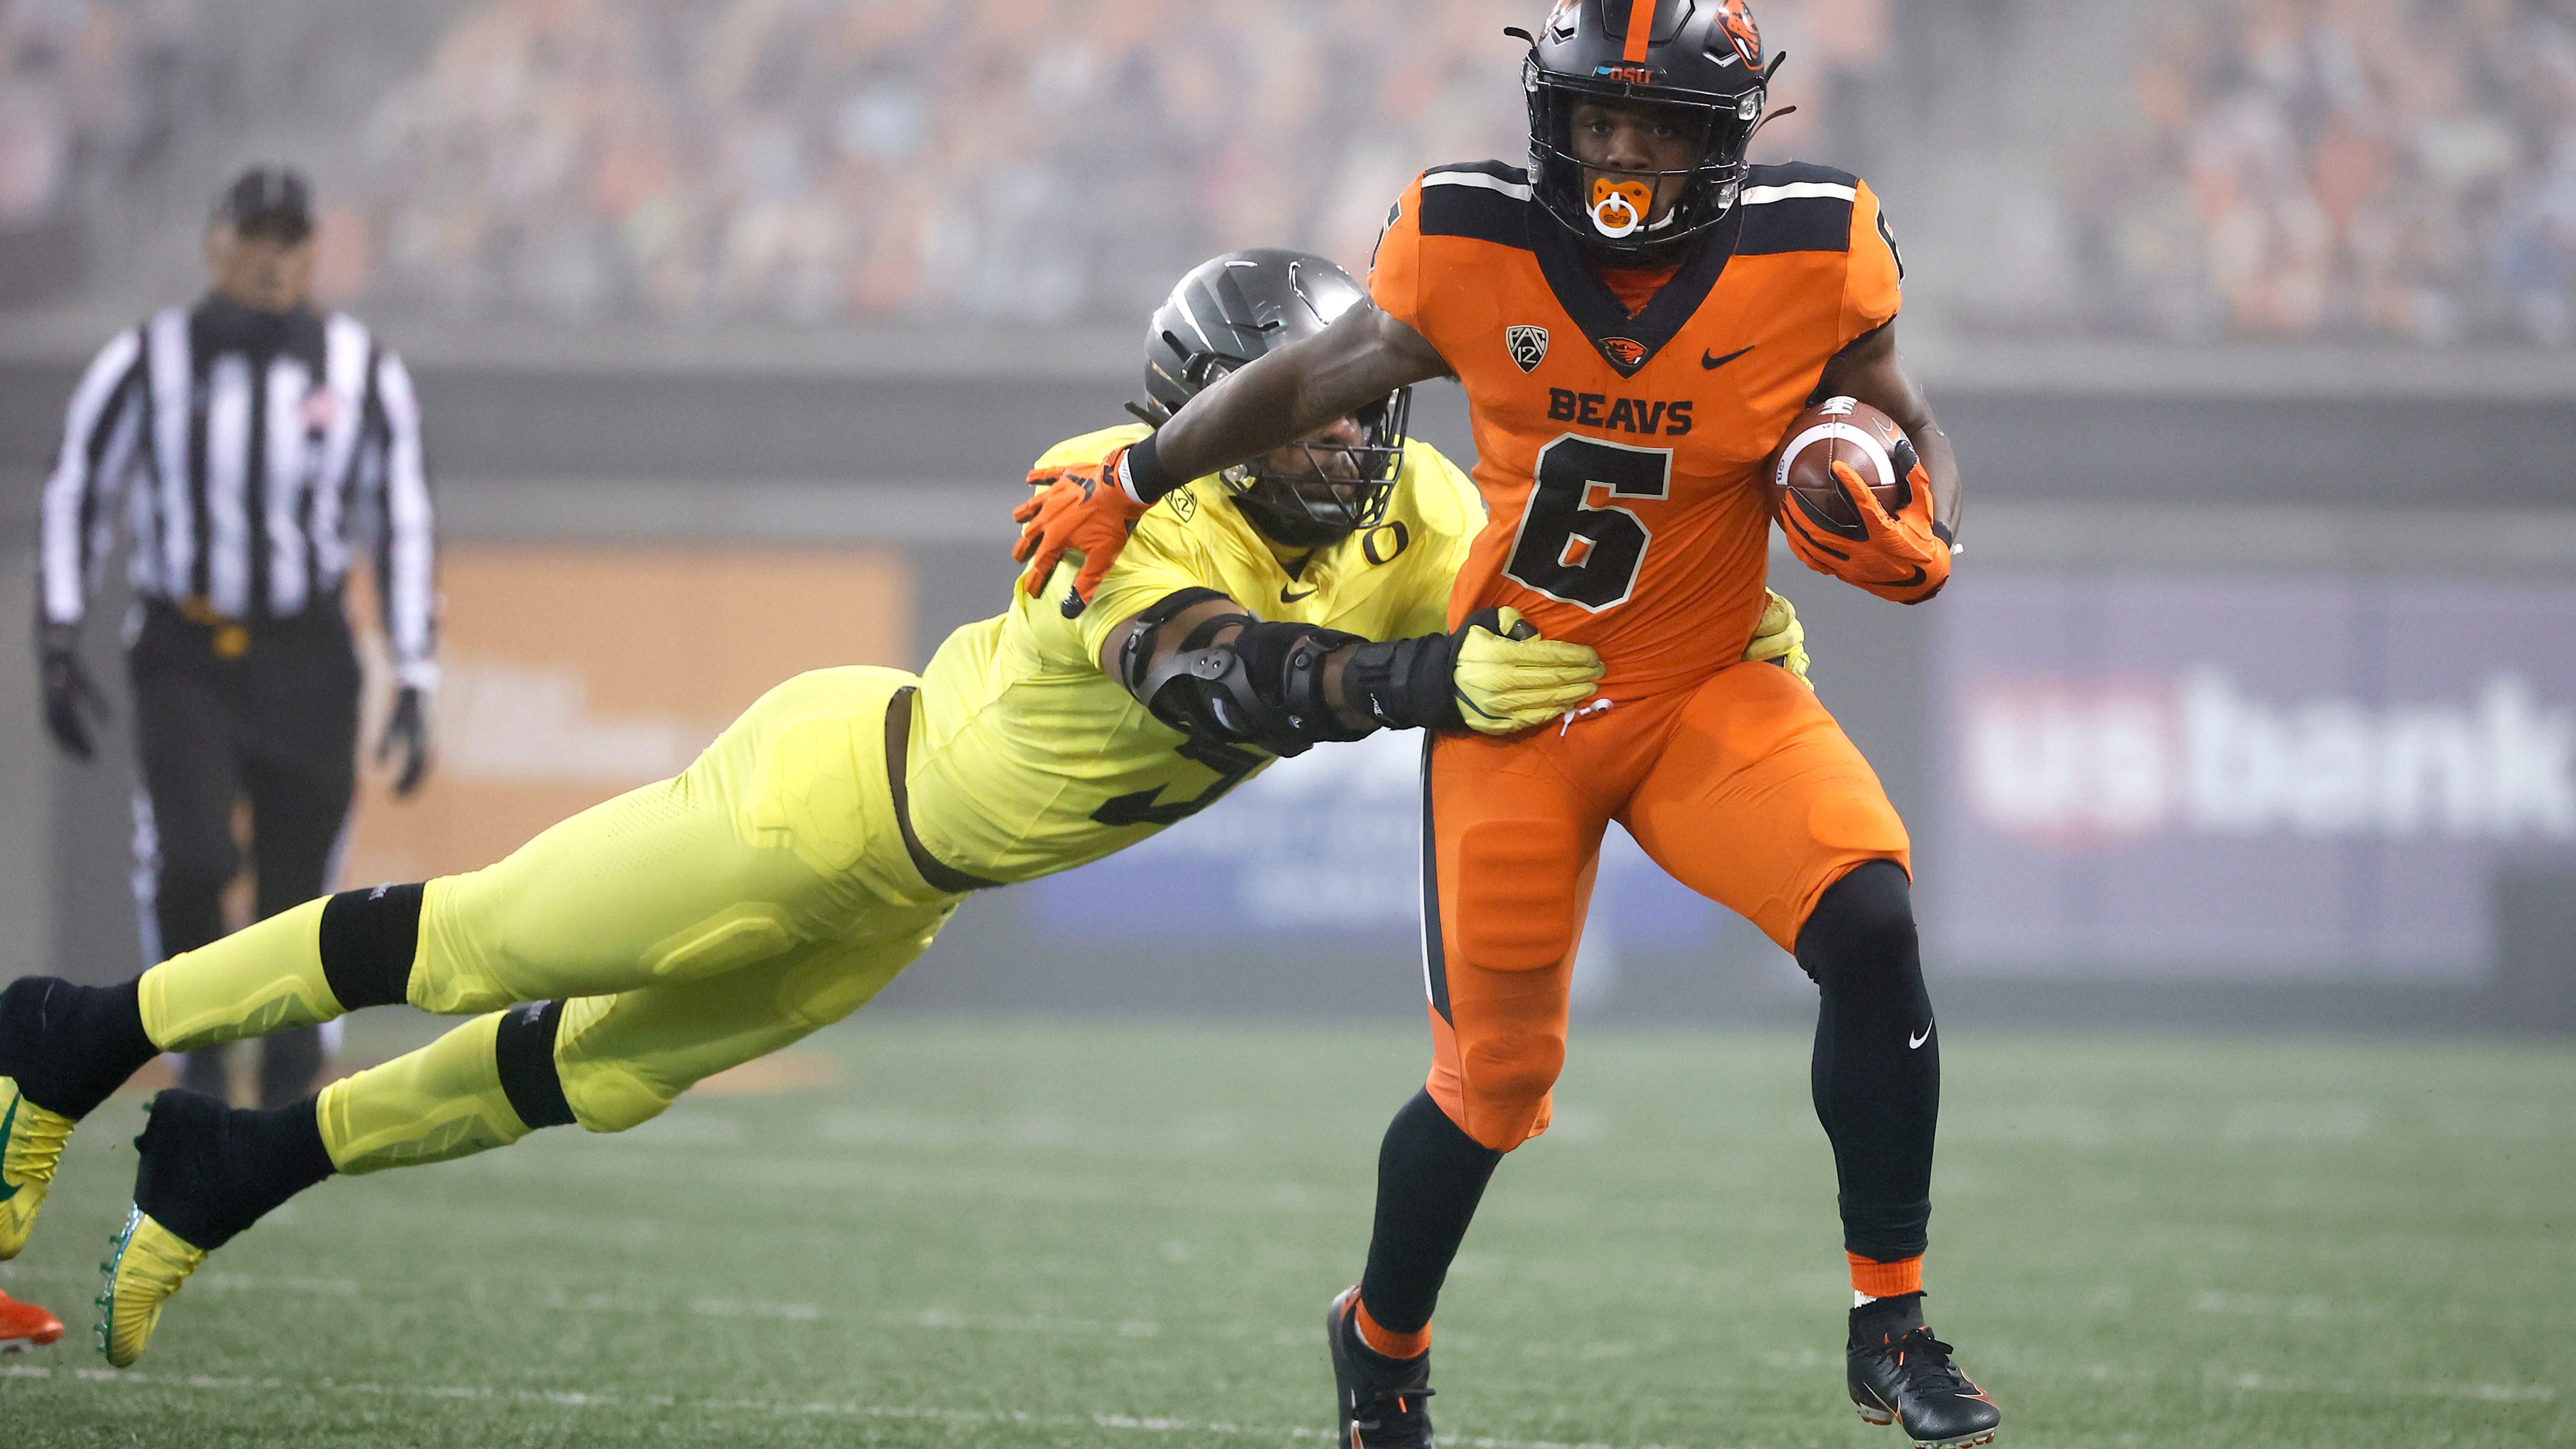 Beavers stun Ducks in rivalry victory